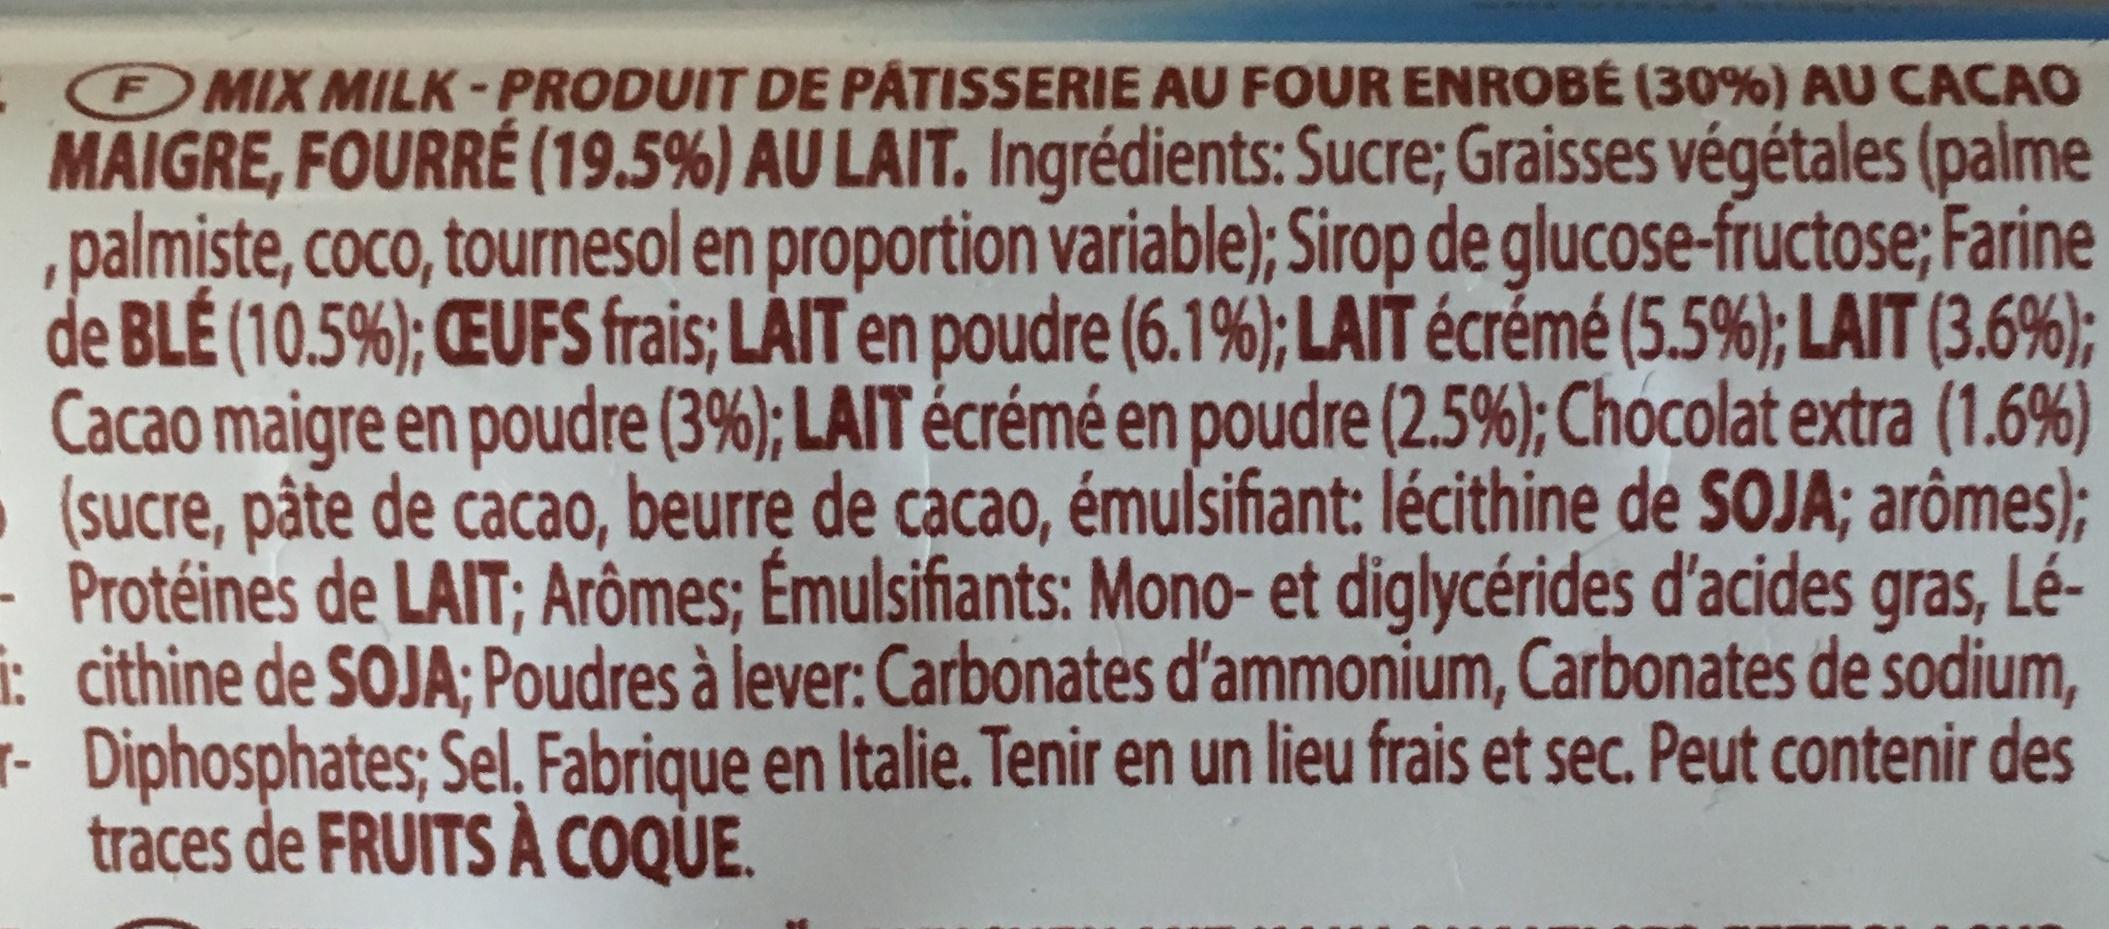 Mix Milk with Velvety Milk Cream Filling x (350g) - Ingredients - fr